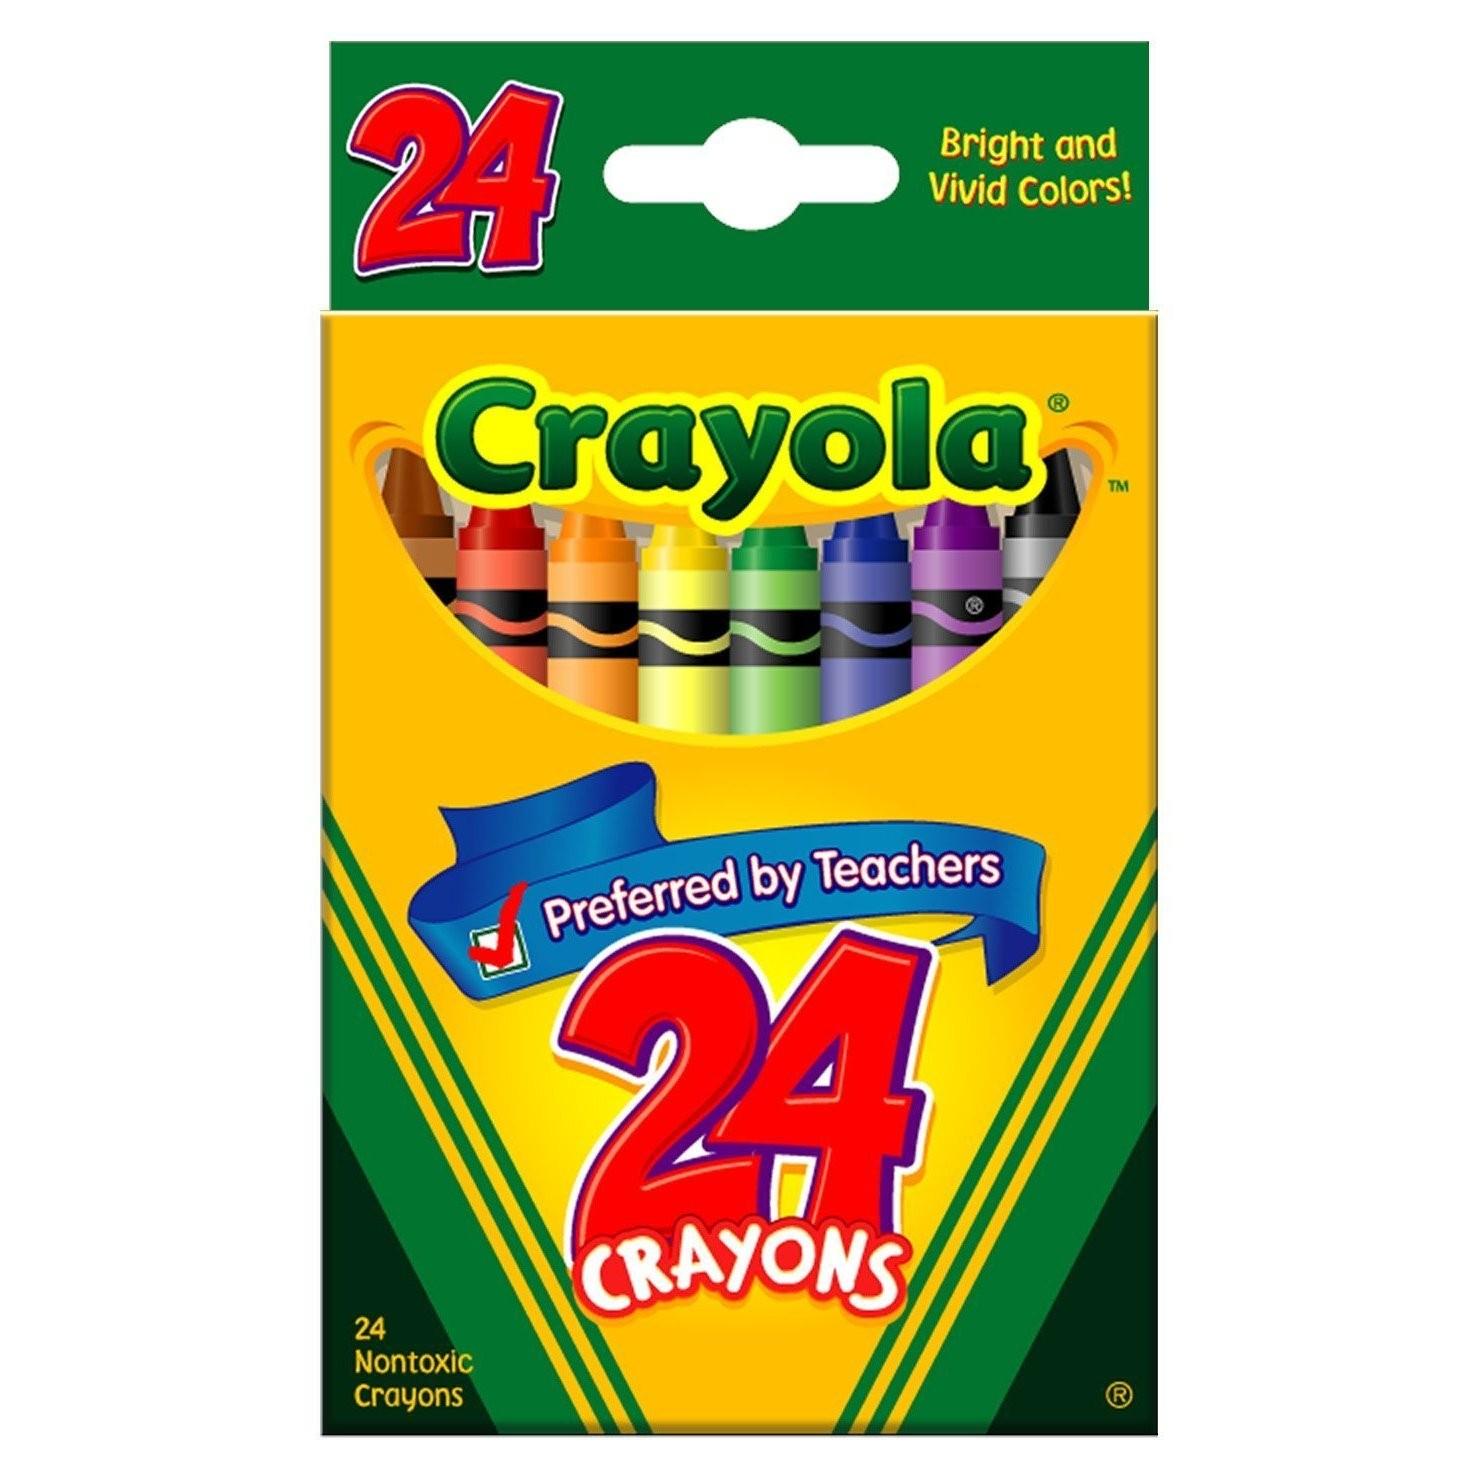 Crayola Crayons Box Clipart Panda